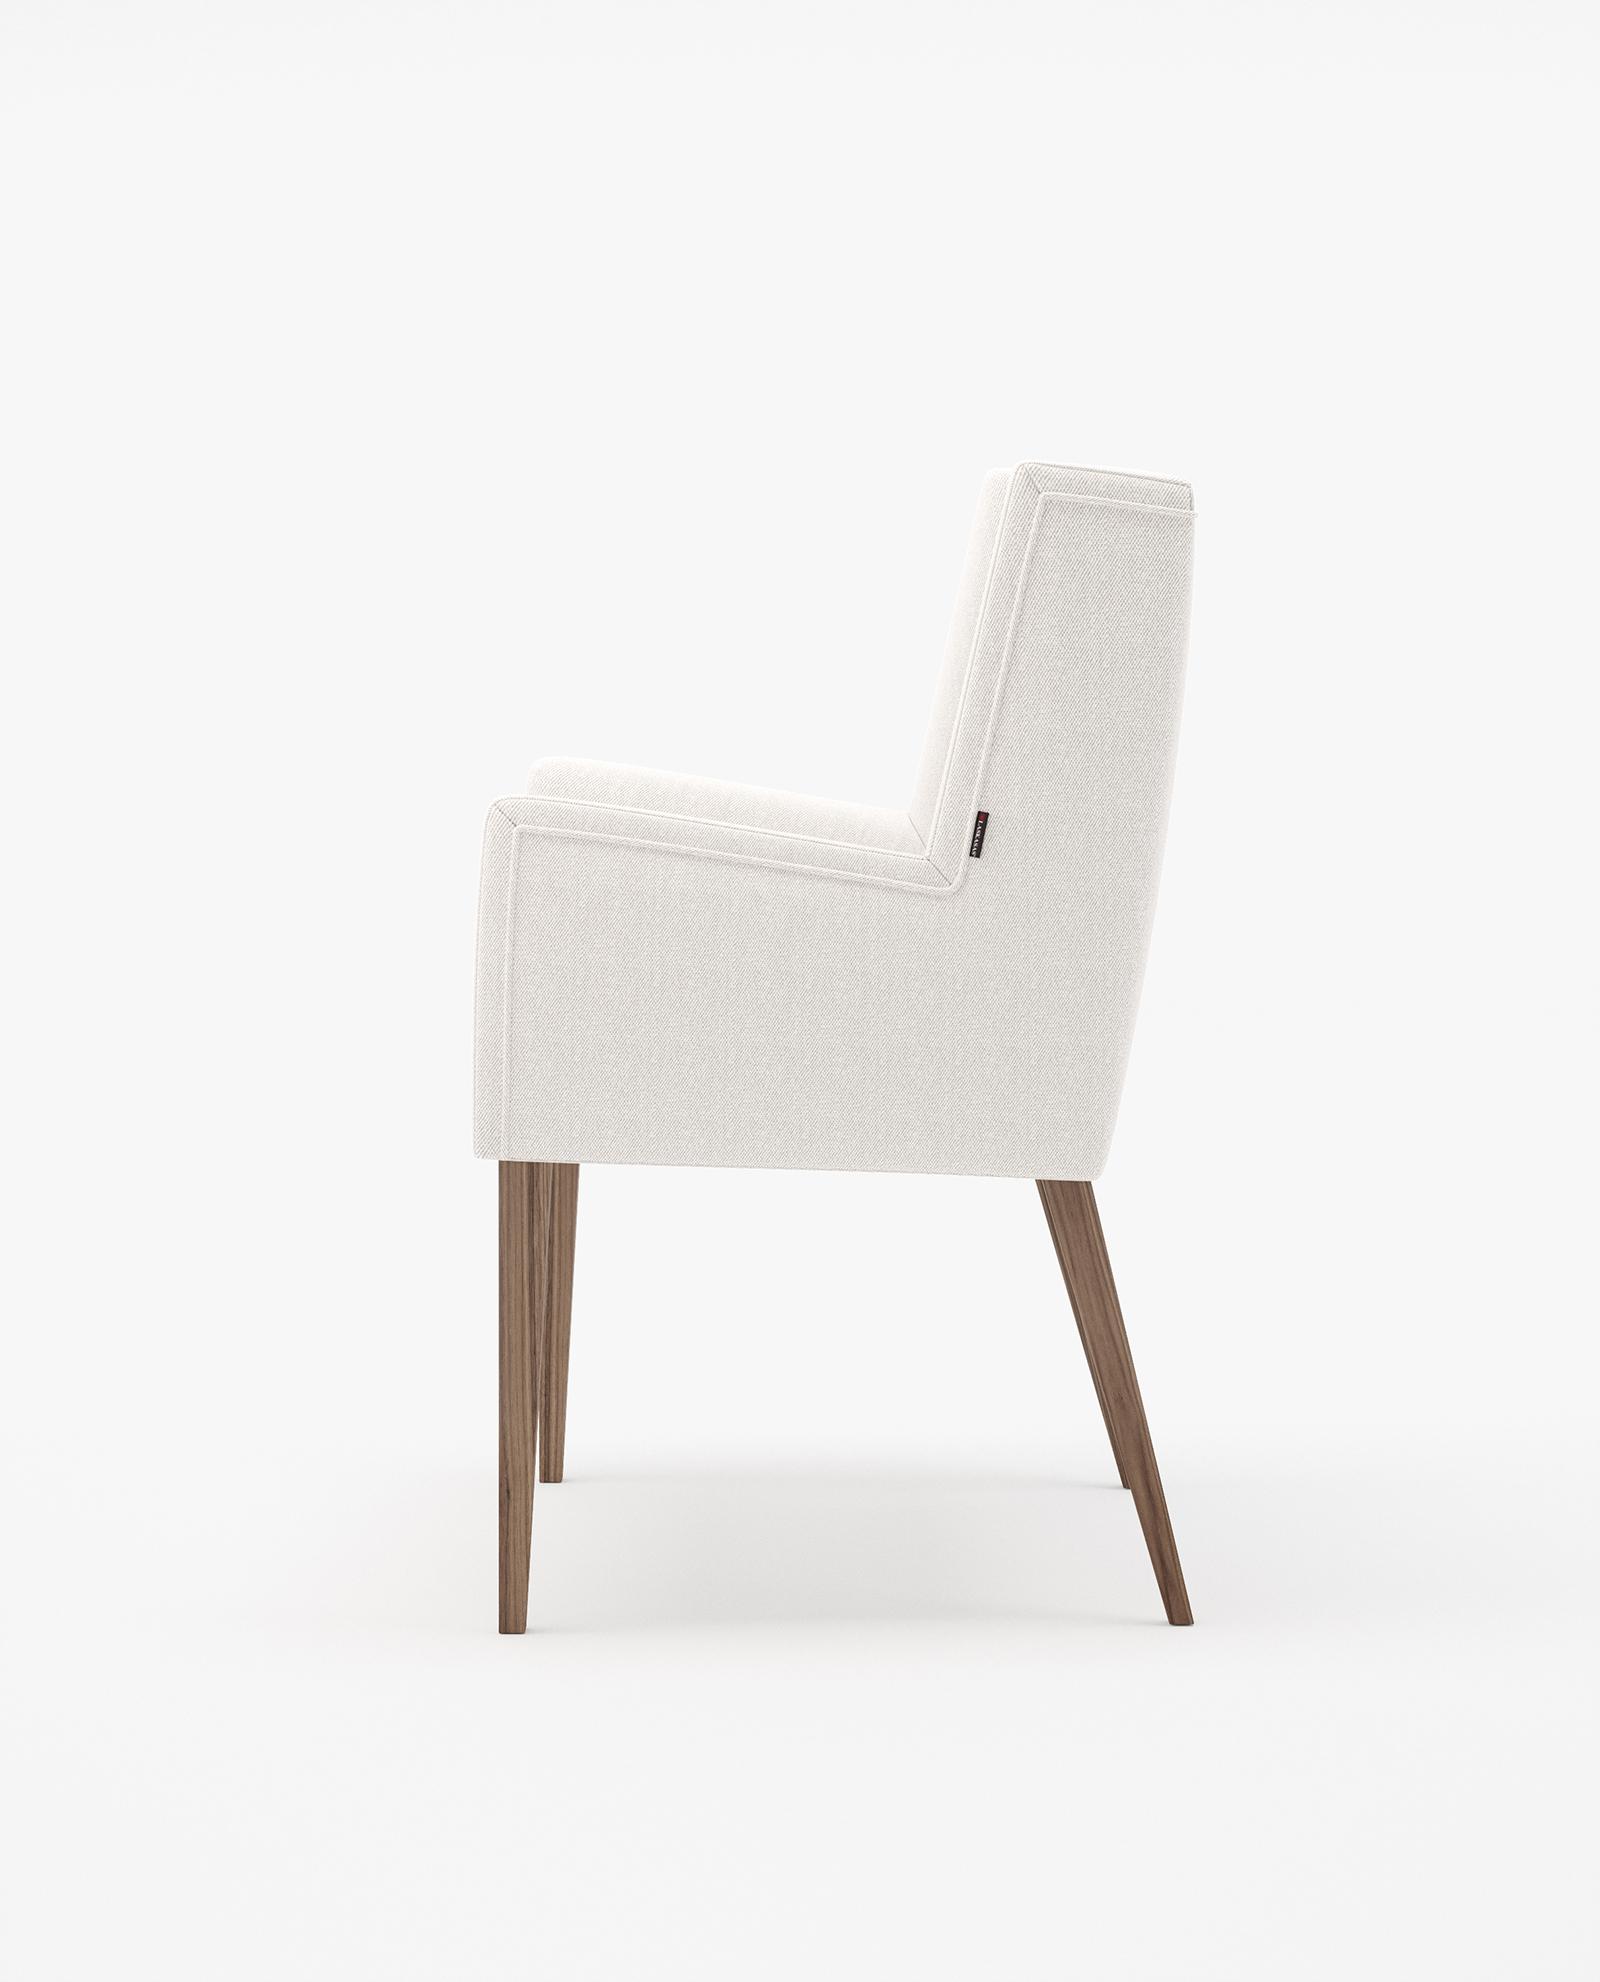 cadeira-bracos-perola-nogueira (3)